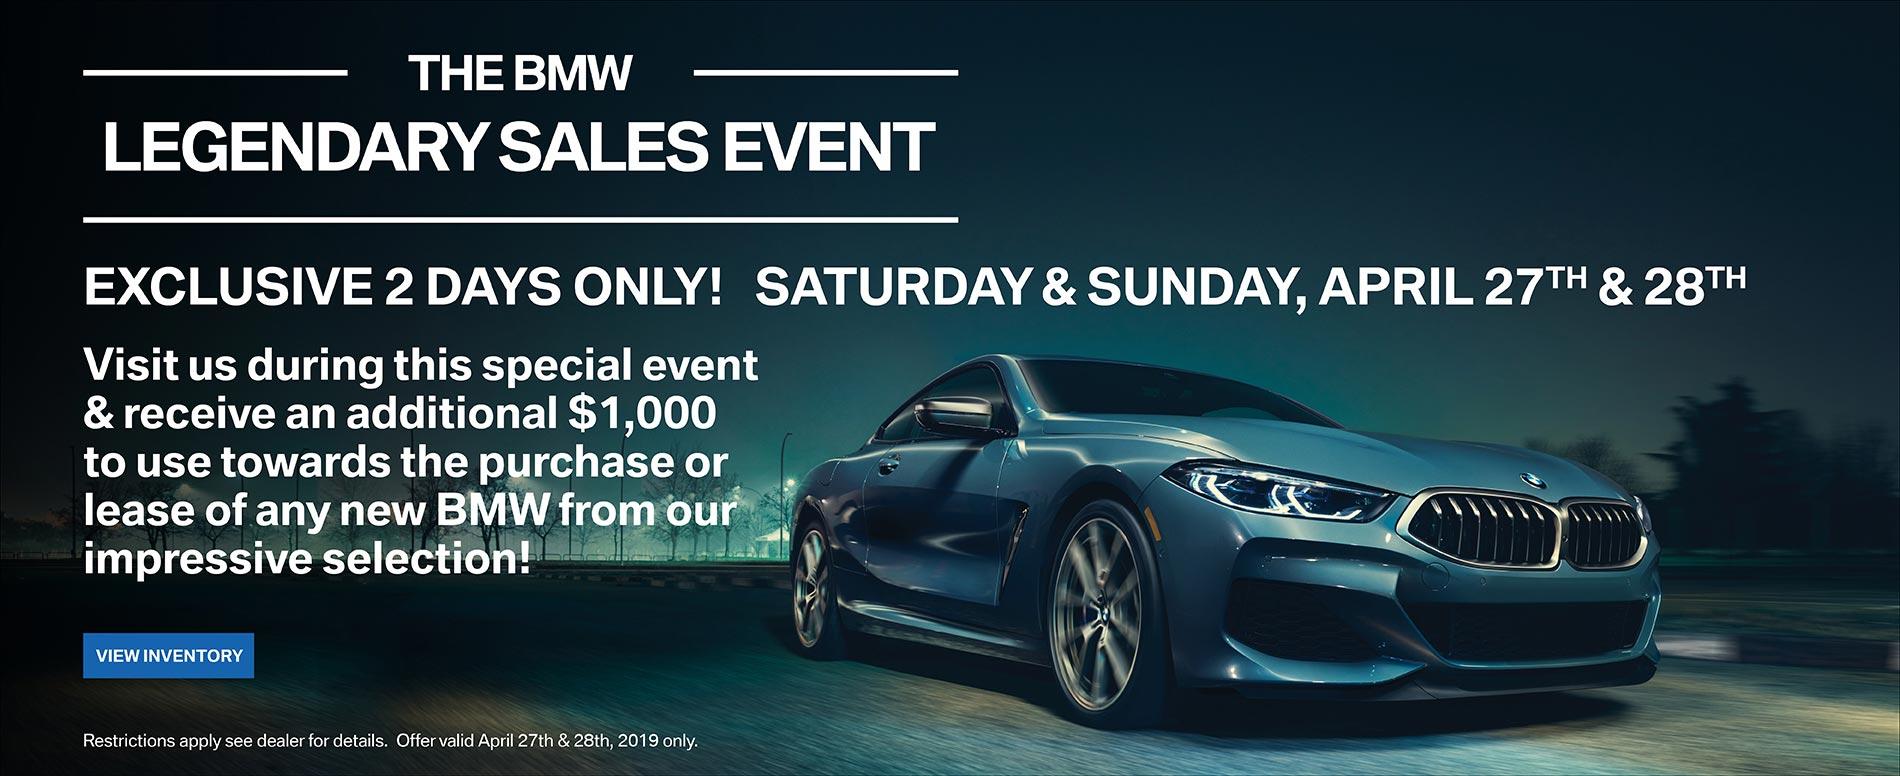 Legendary Sales Event